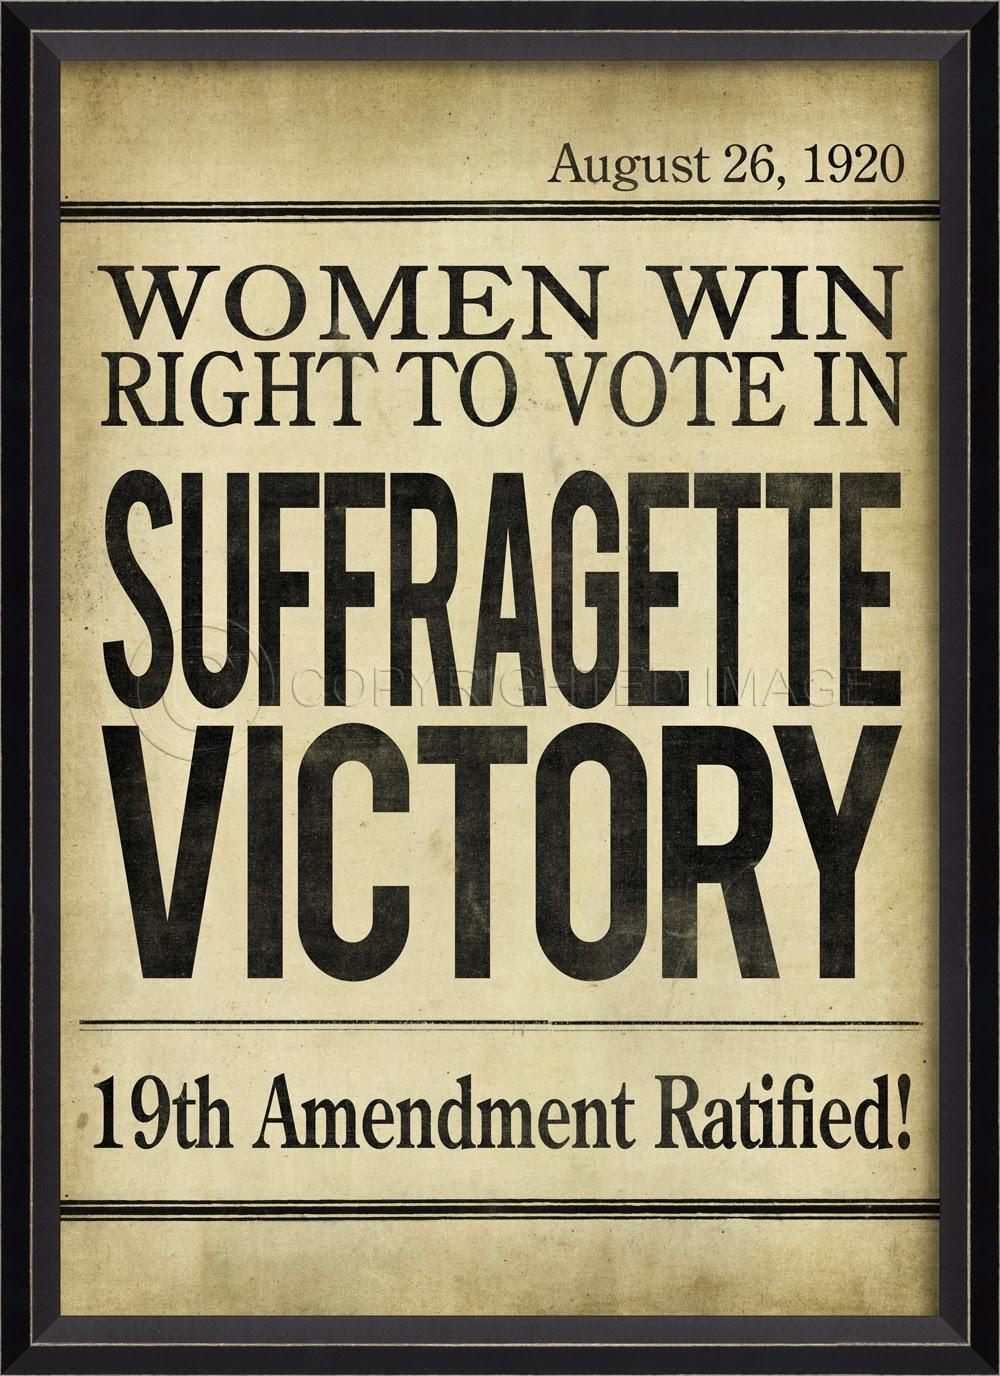 Suffrage Quotes: Suffragettes Quotes. QuotesGram